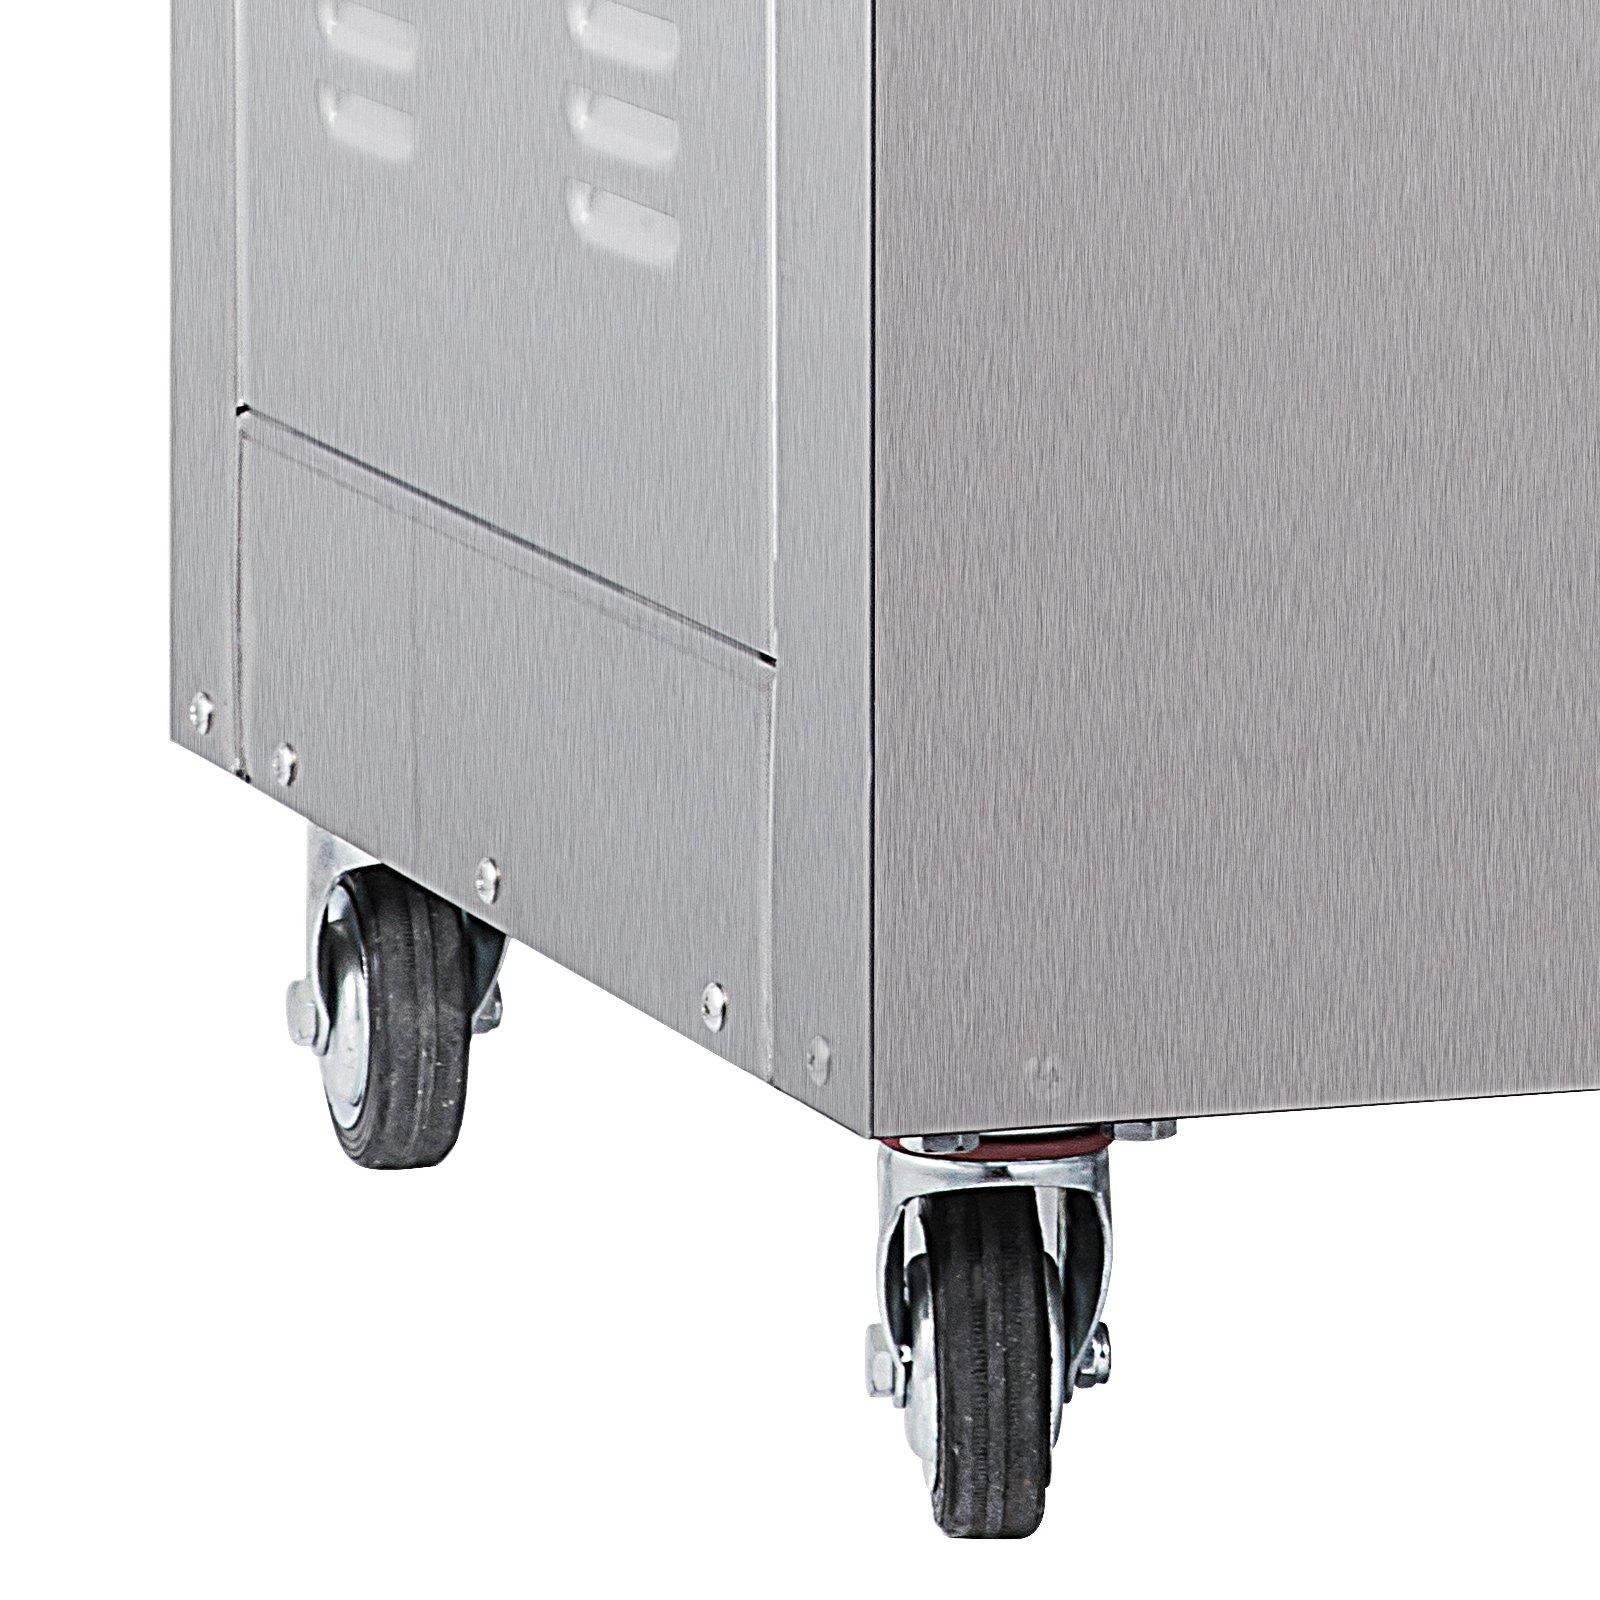 Happybuy DZ-400/2E Chamber Vacuum Sealer 1000W Vacuum Sealer Machine Automatic Vacuum Packing Sealing Sealer Machine for Home or Commercial Use (DZ-400/2E) by Happybuy (Image #6)